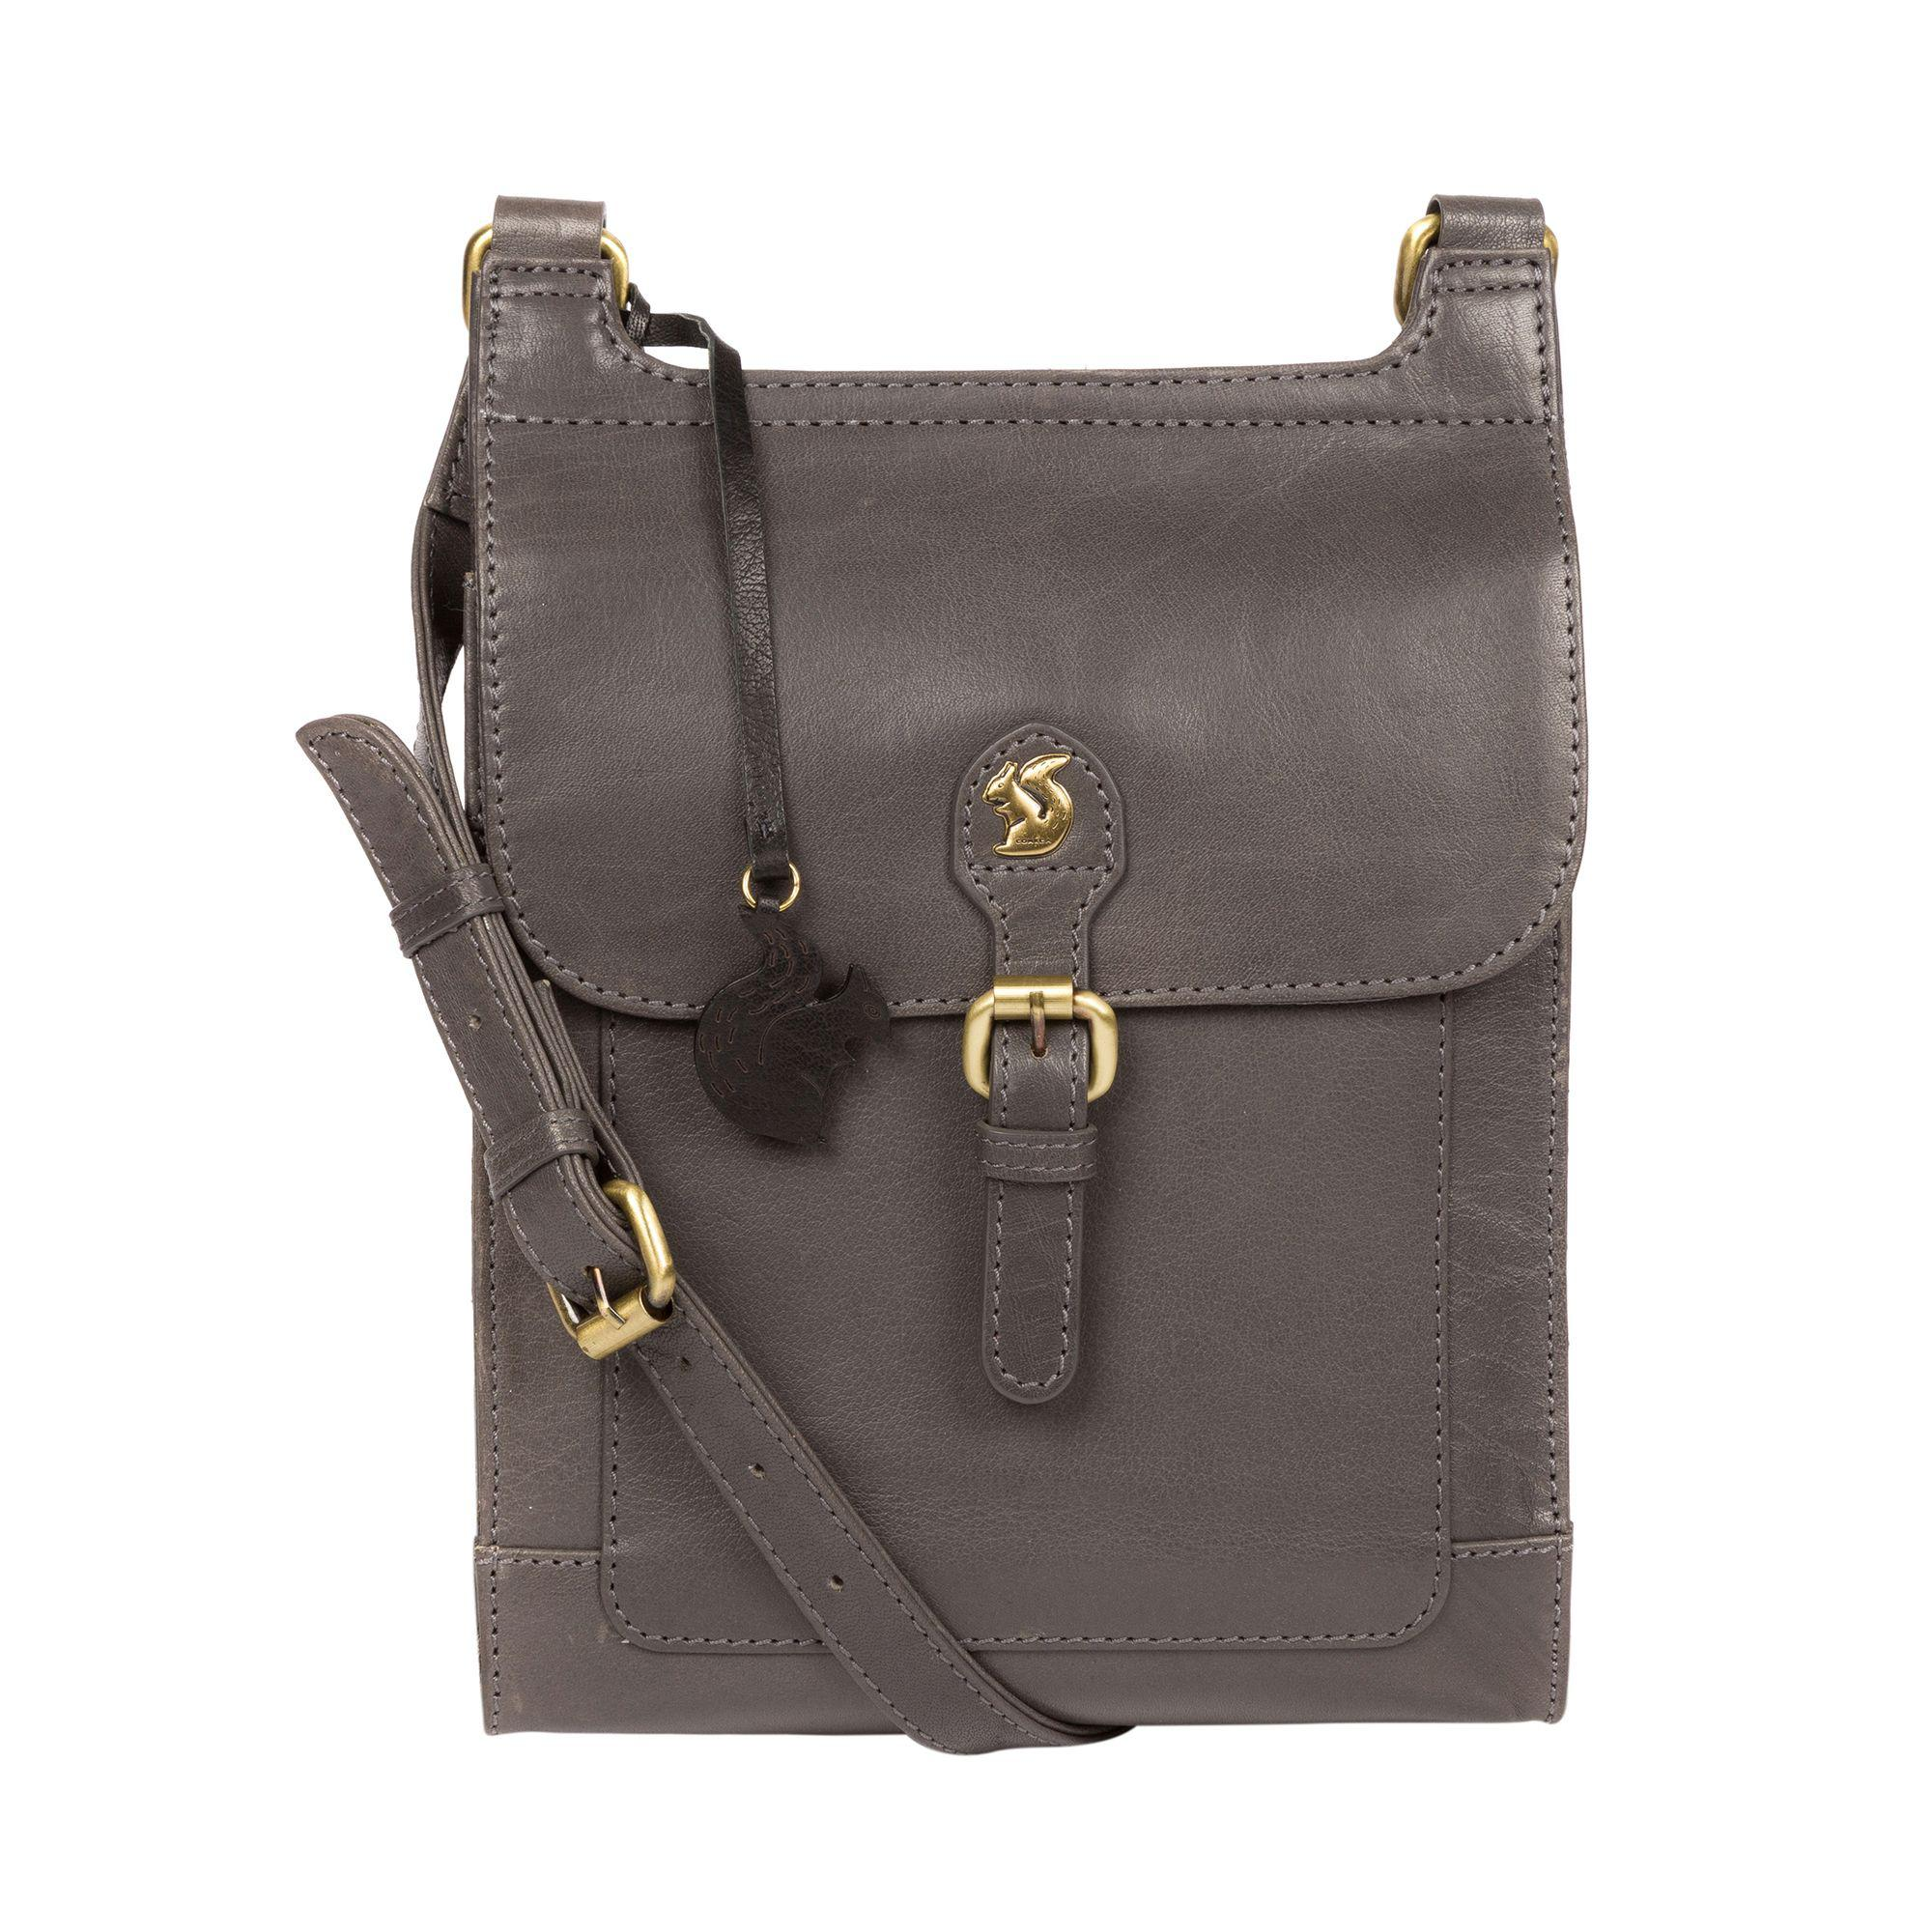 74cfbf61fa75 Conkca London Slate  sasha  Leather Cross-body Bag in Gray - Lyst